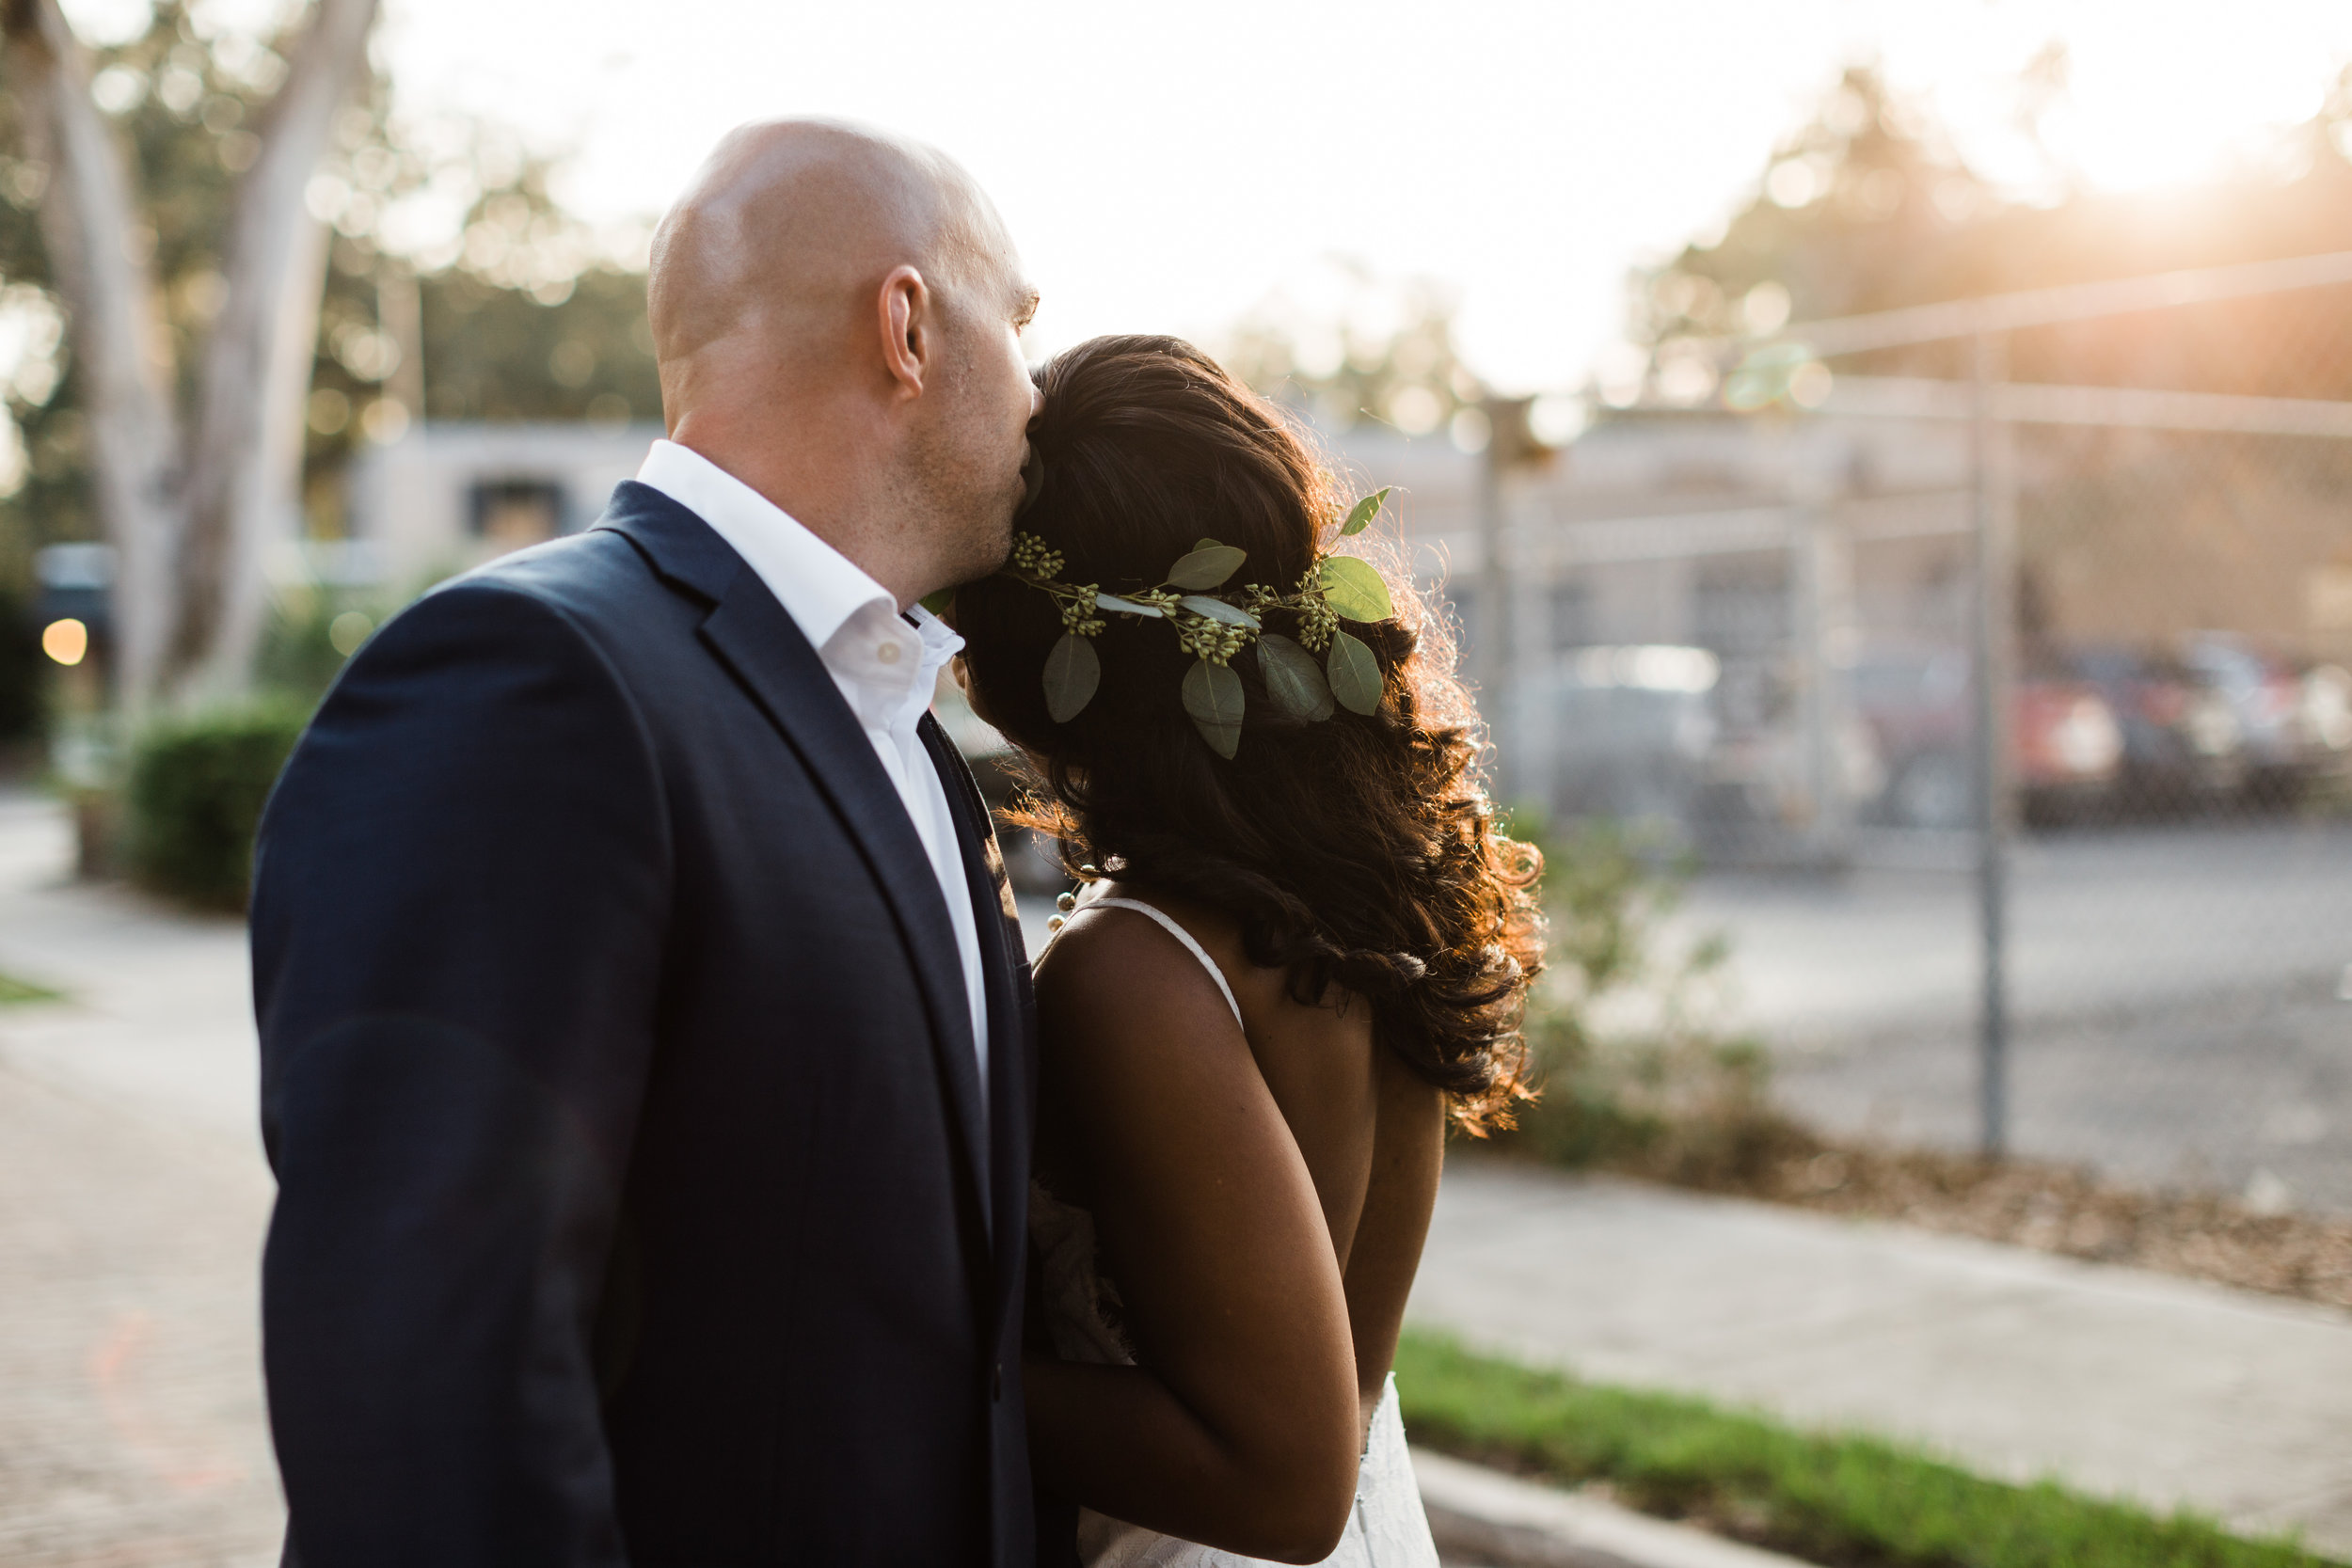 2017.09.16 Ashley and Chuck O'Day Quantam Leap Winery Wedding (430 of 462).jpg